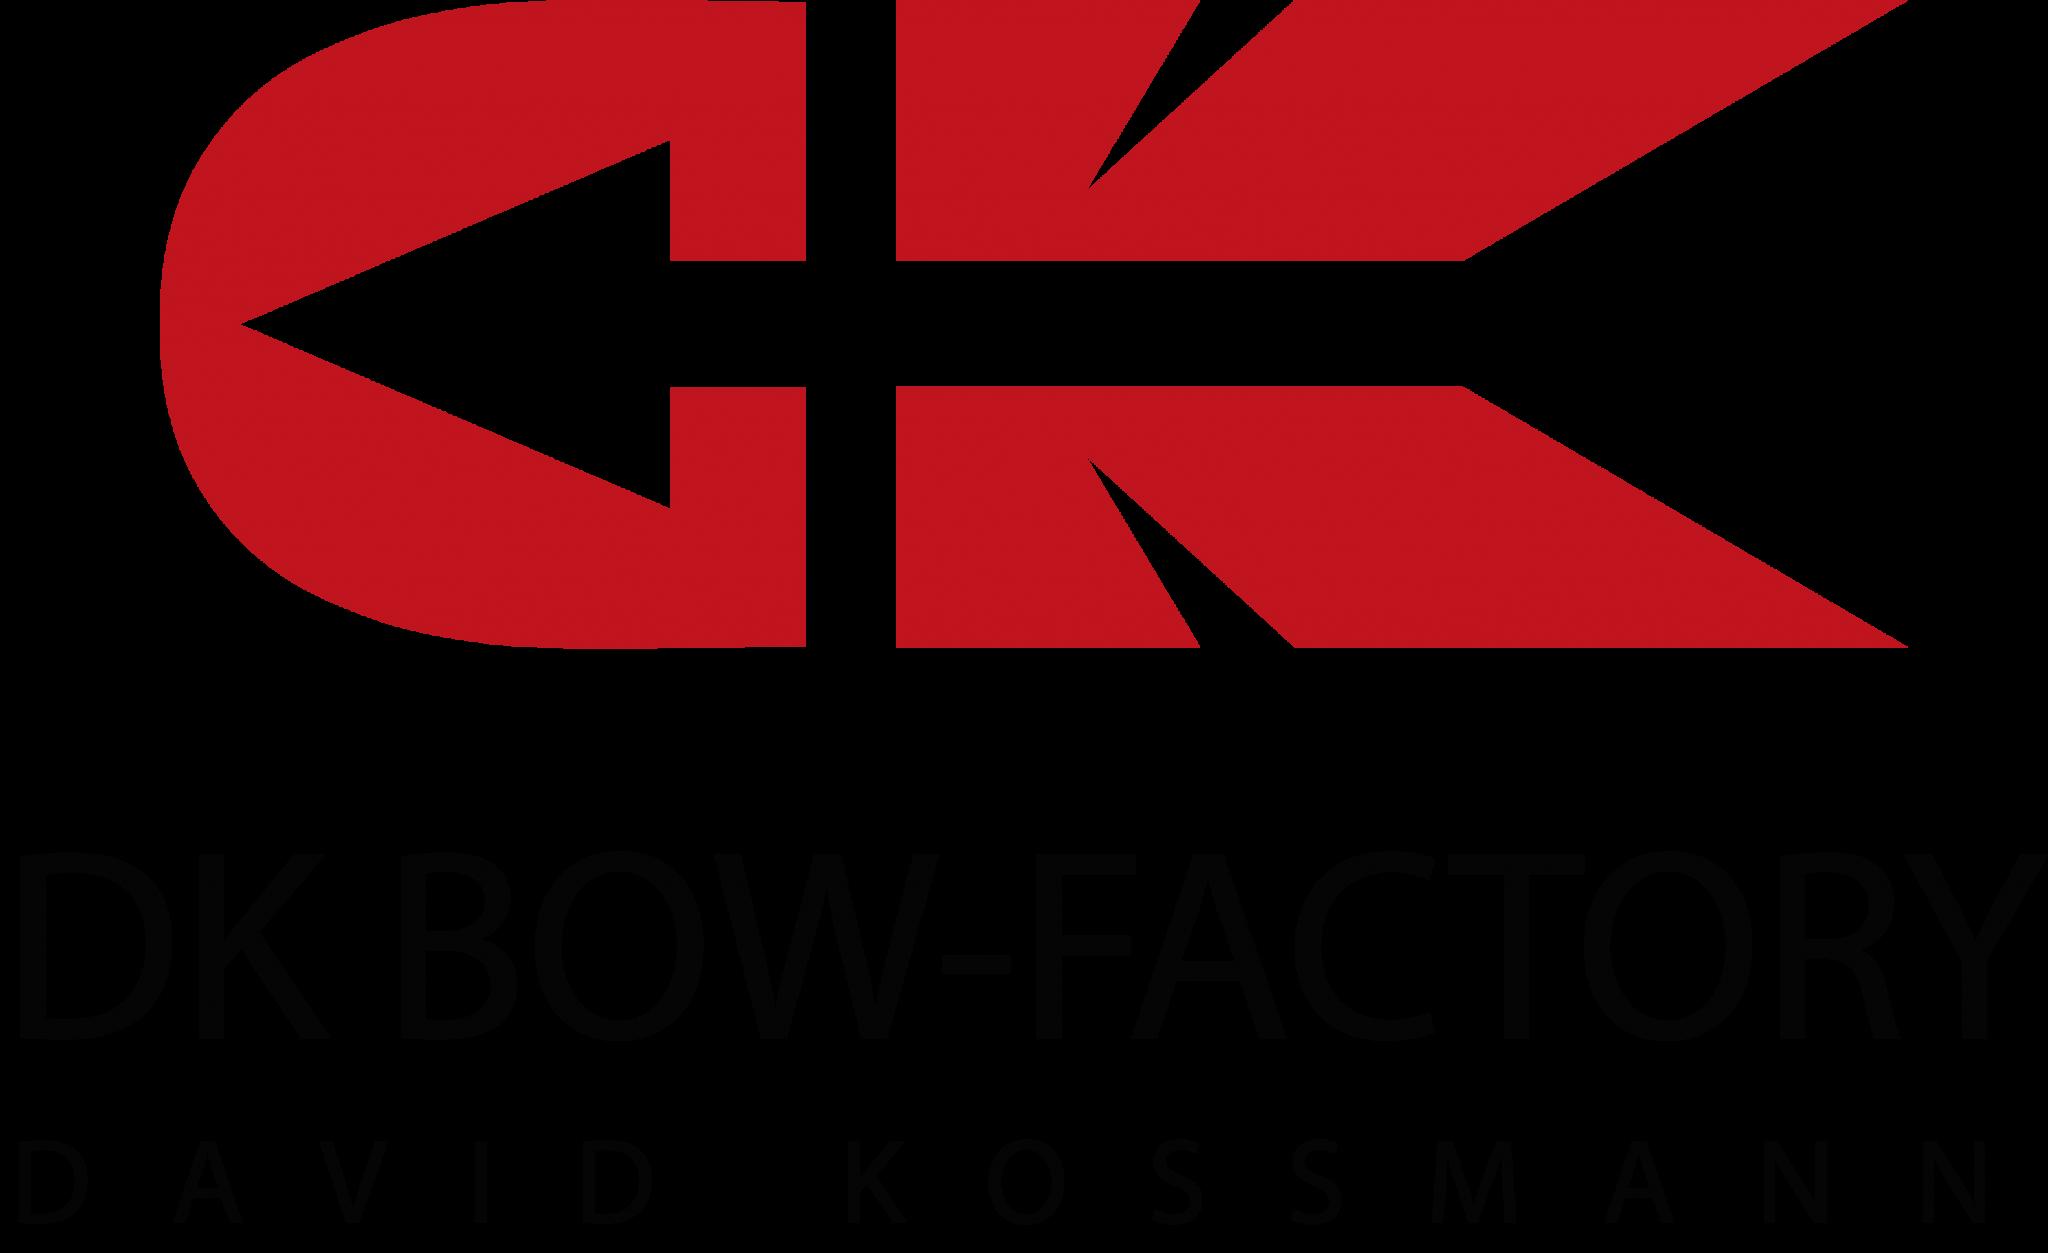 cropped-DK_Logo_transparent_000000-2048x1253